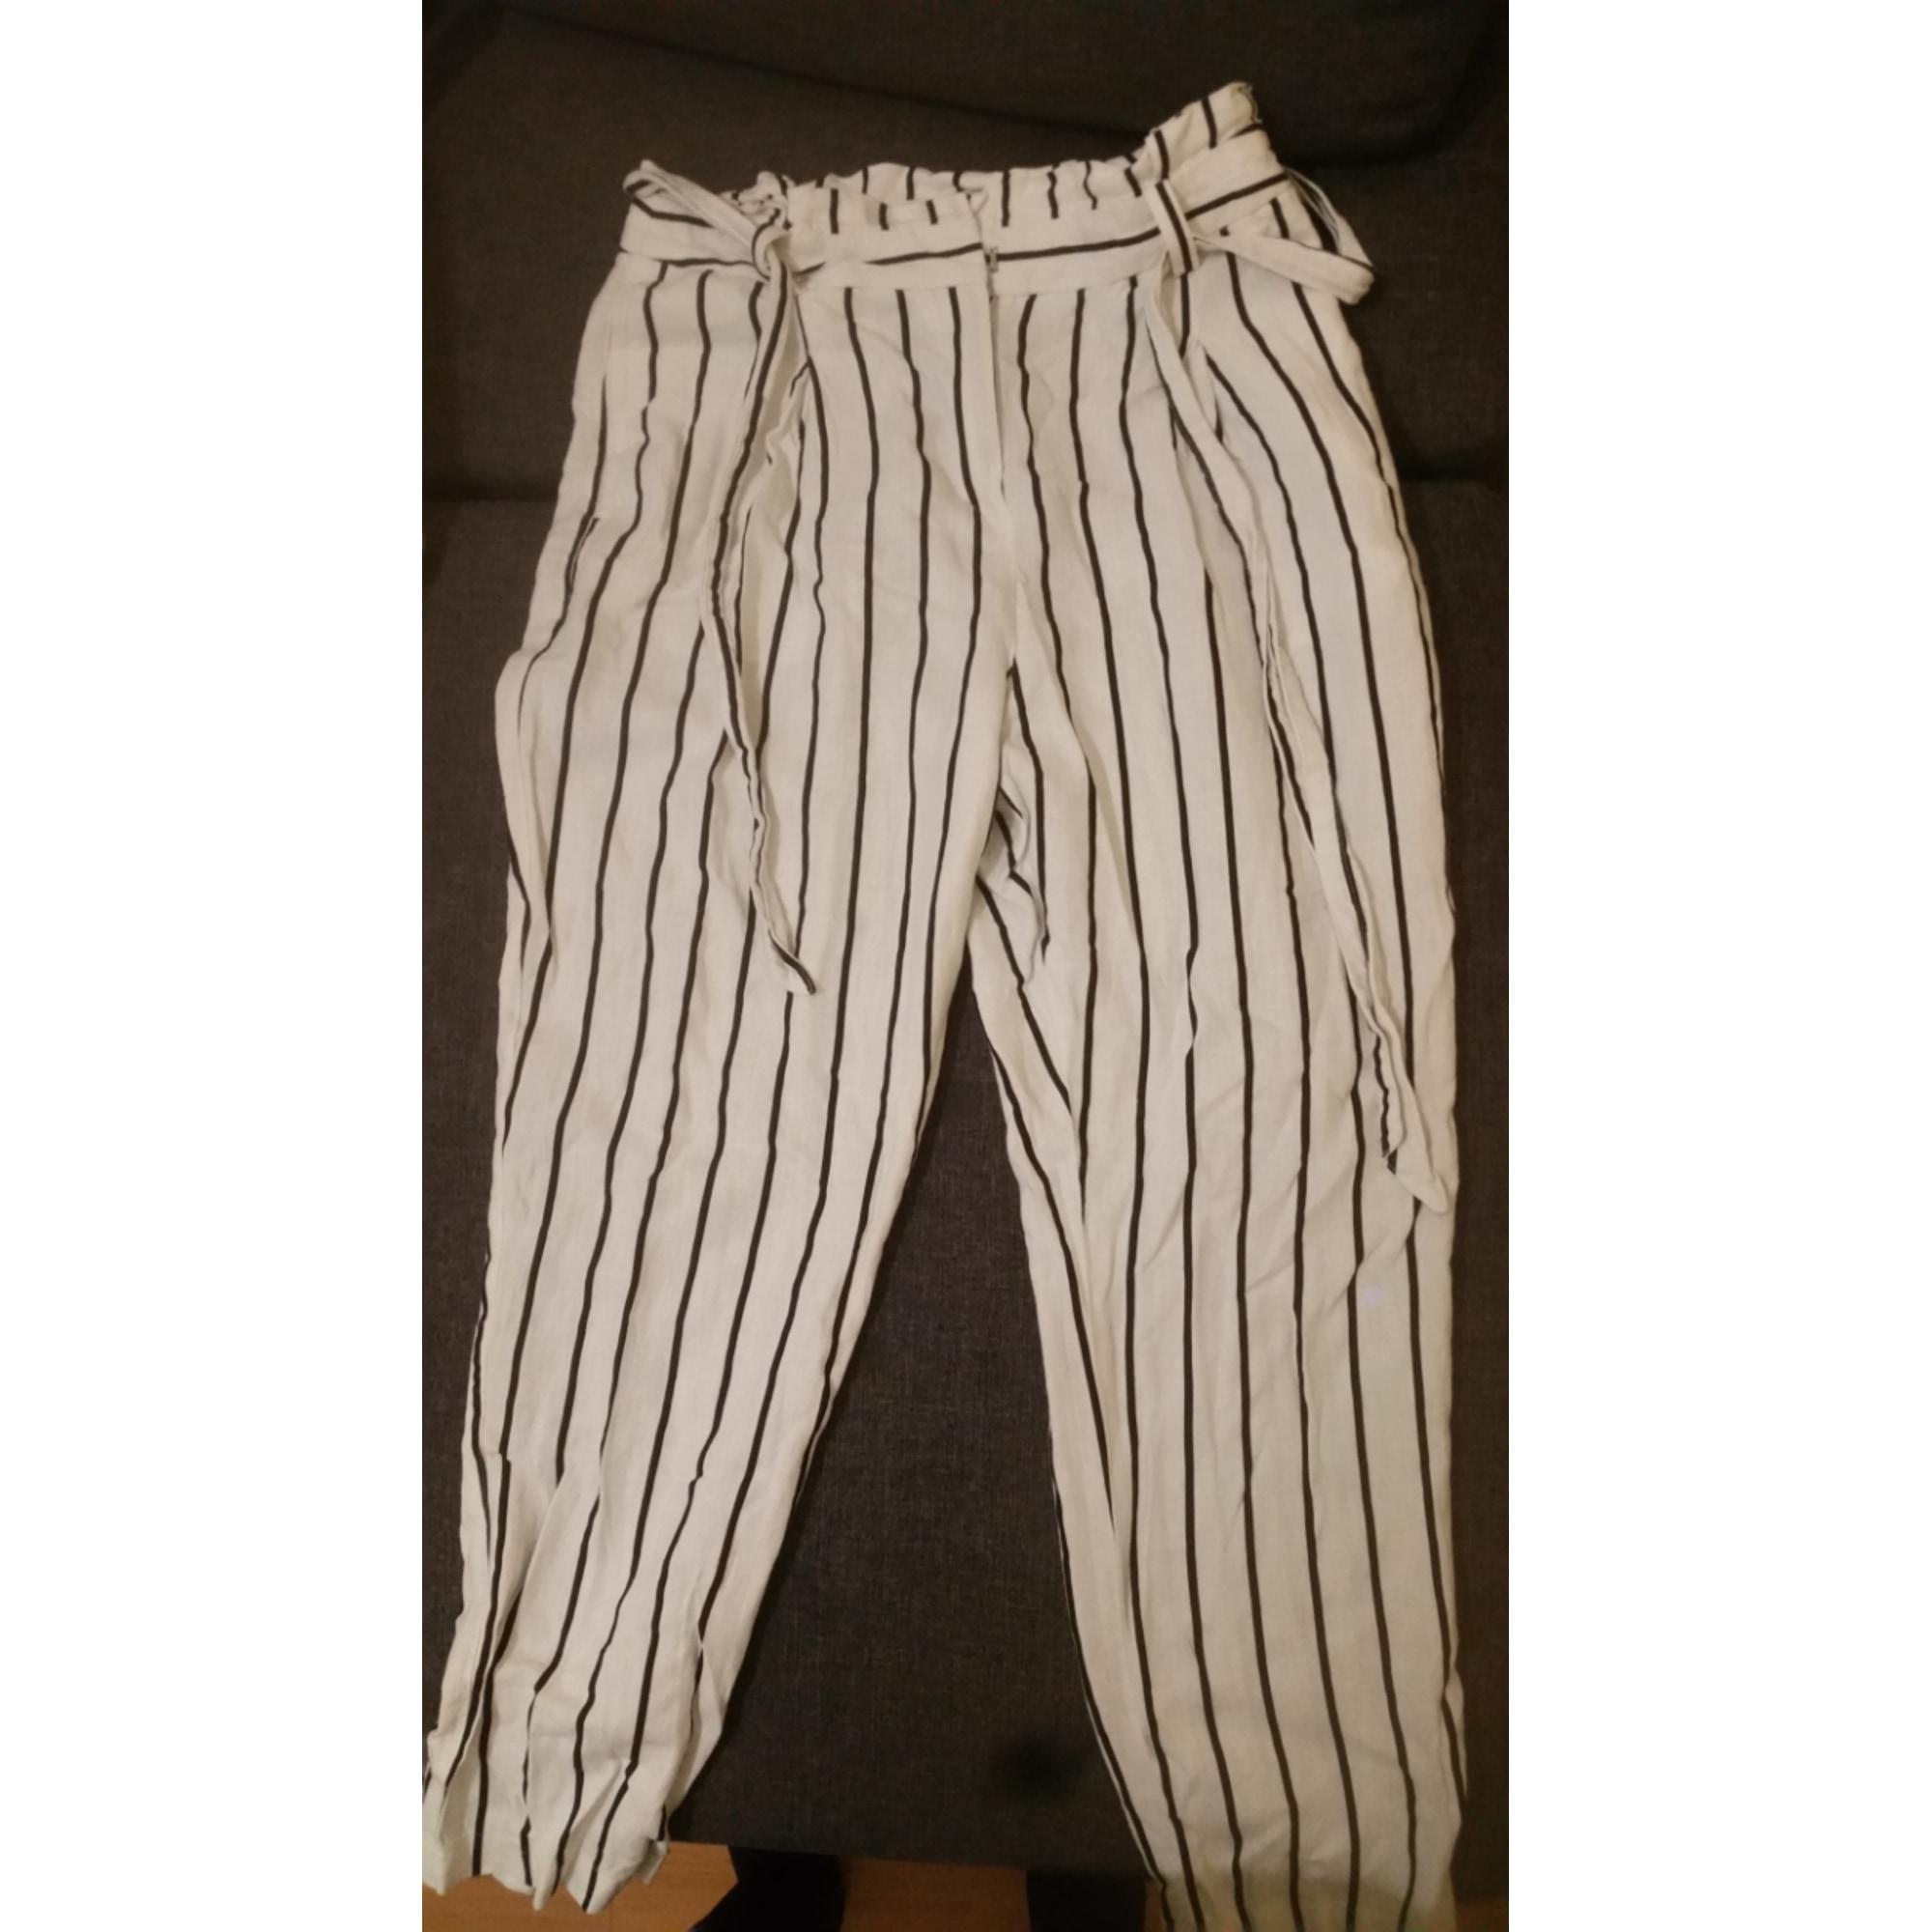 Pantalon carotte ASOS Blanc, blanc cassé, écru